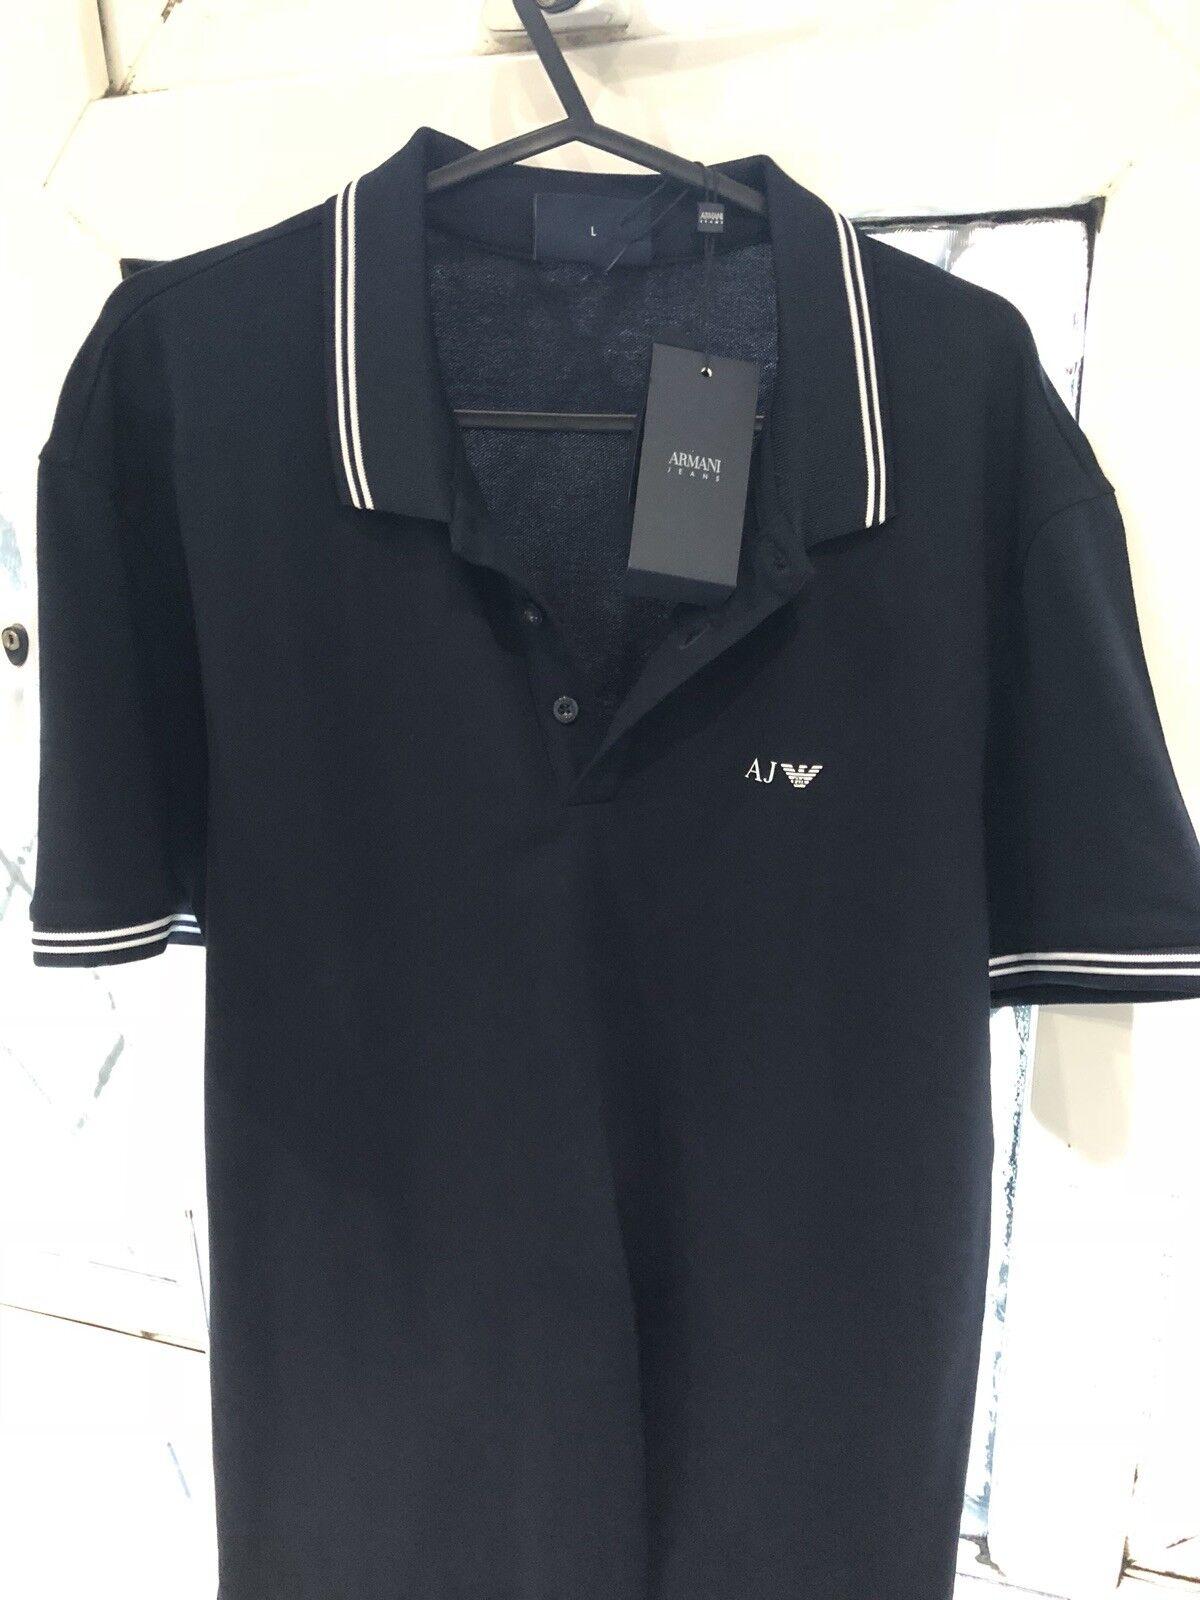 Armani Jeans - AJ - Men's Polo Shirt - Navy - BRAND NEW ...